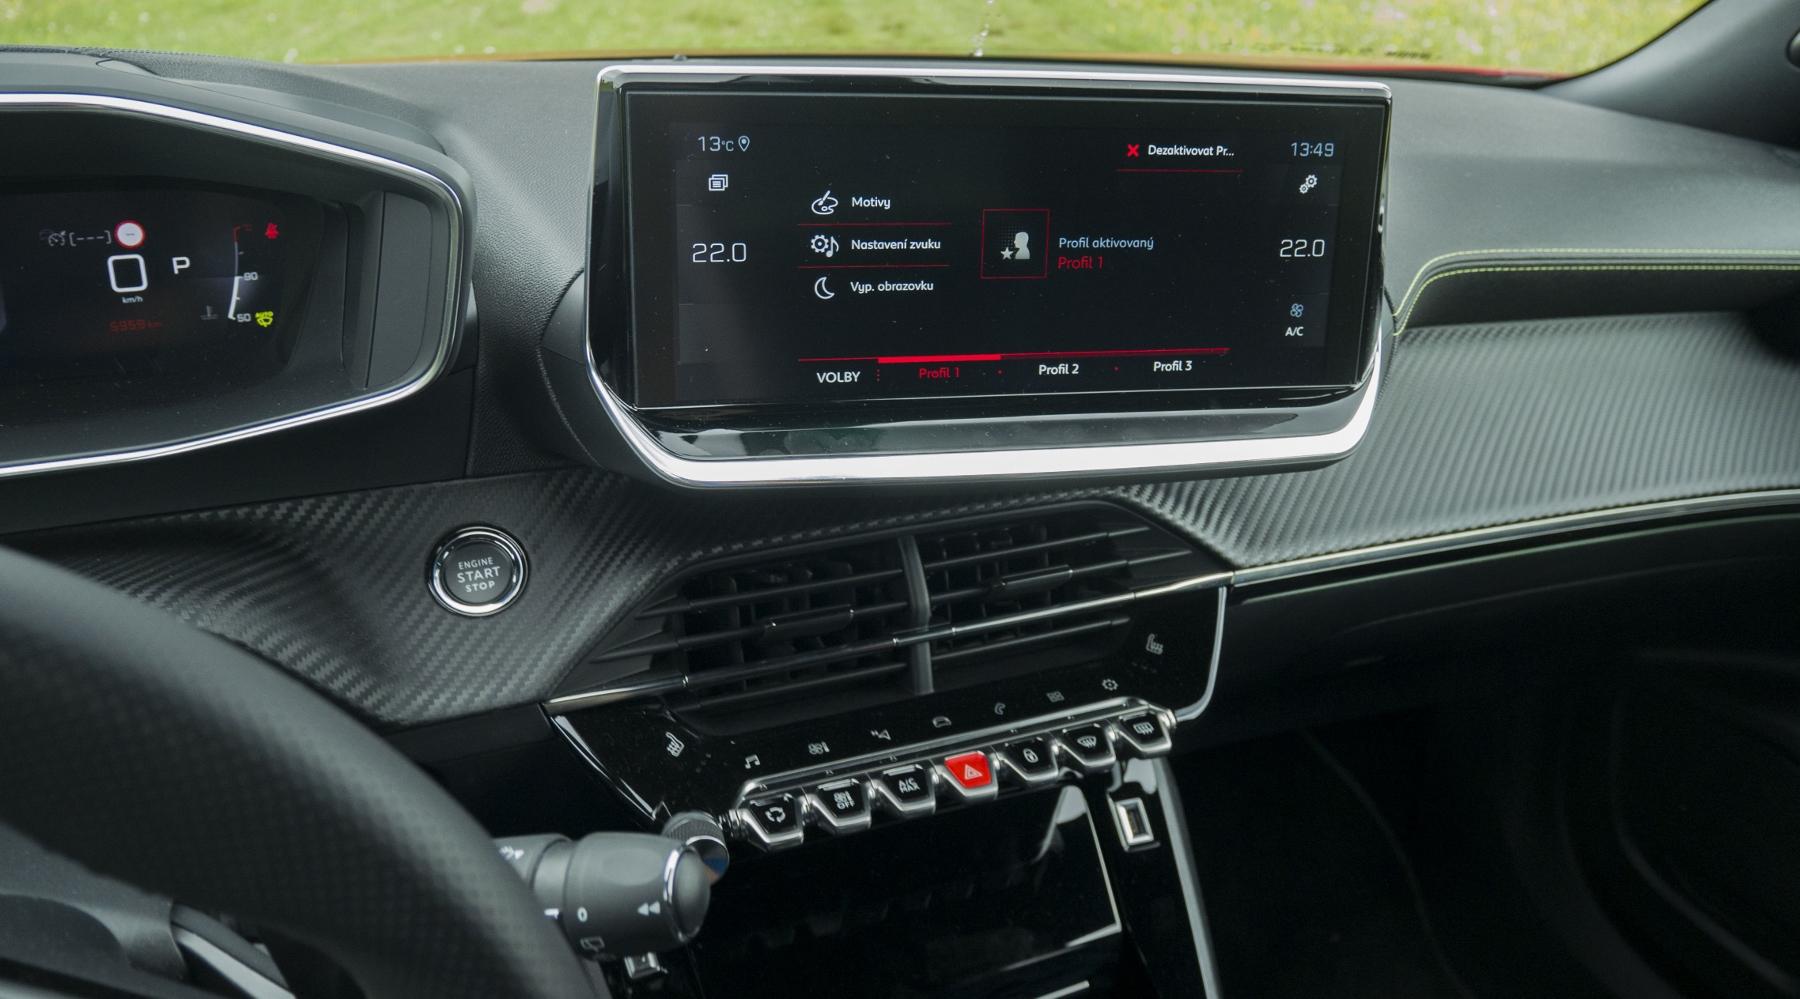 Test: Peugeot 2008 GT ohuruje silným trojvalcom a dobrou prevodovkou zUAVX26mfw peugeot-2008-53